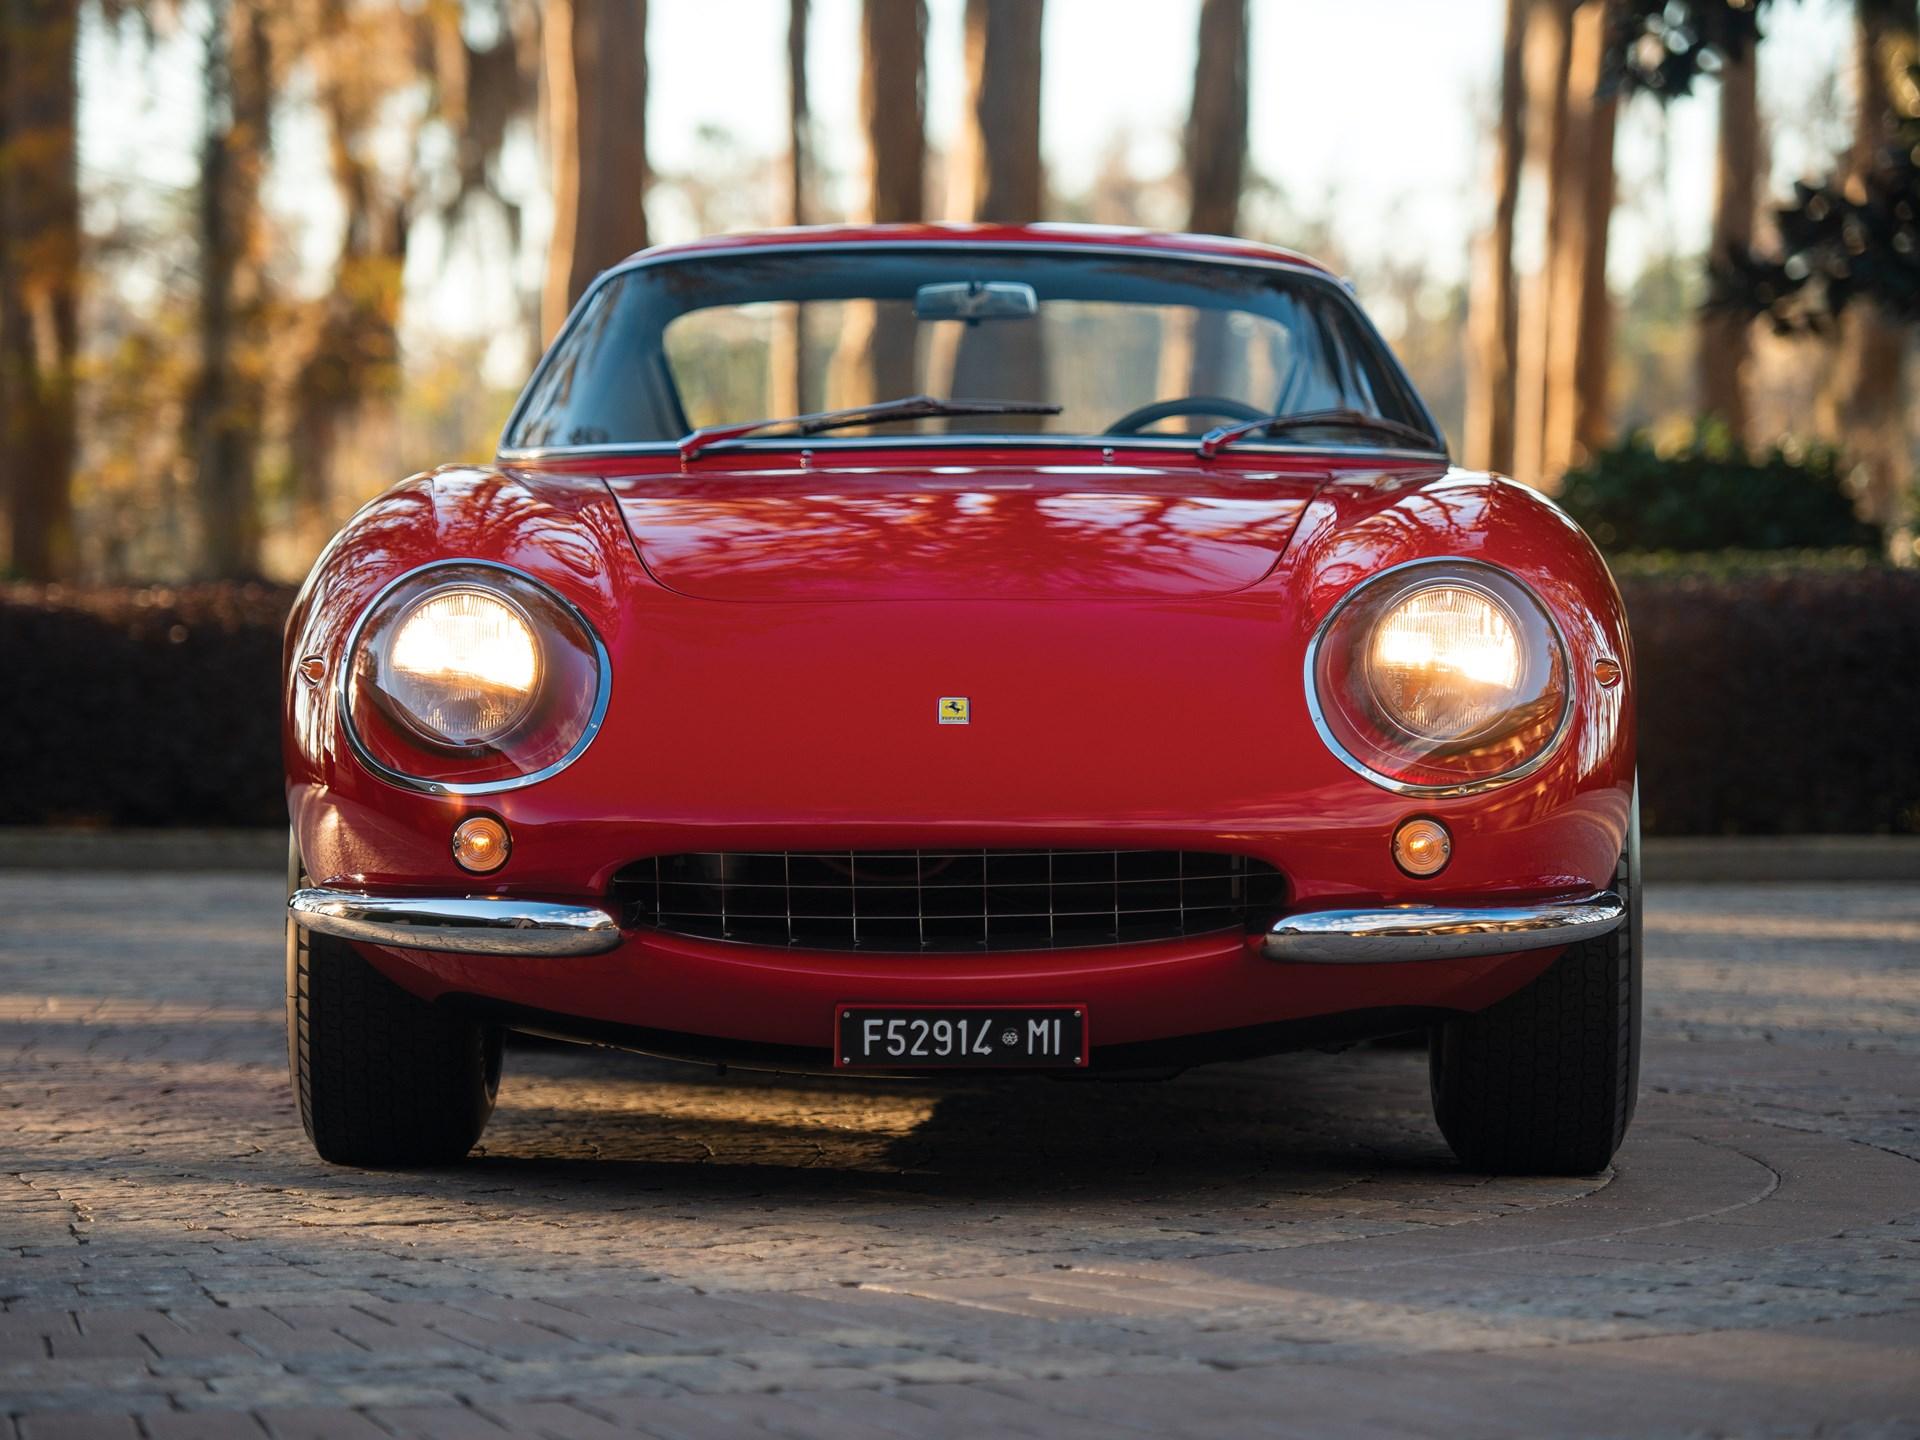 1966 Ferrari 275 GTB/C by Scaglietti